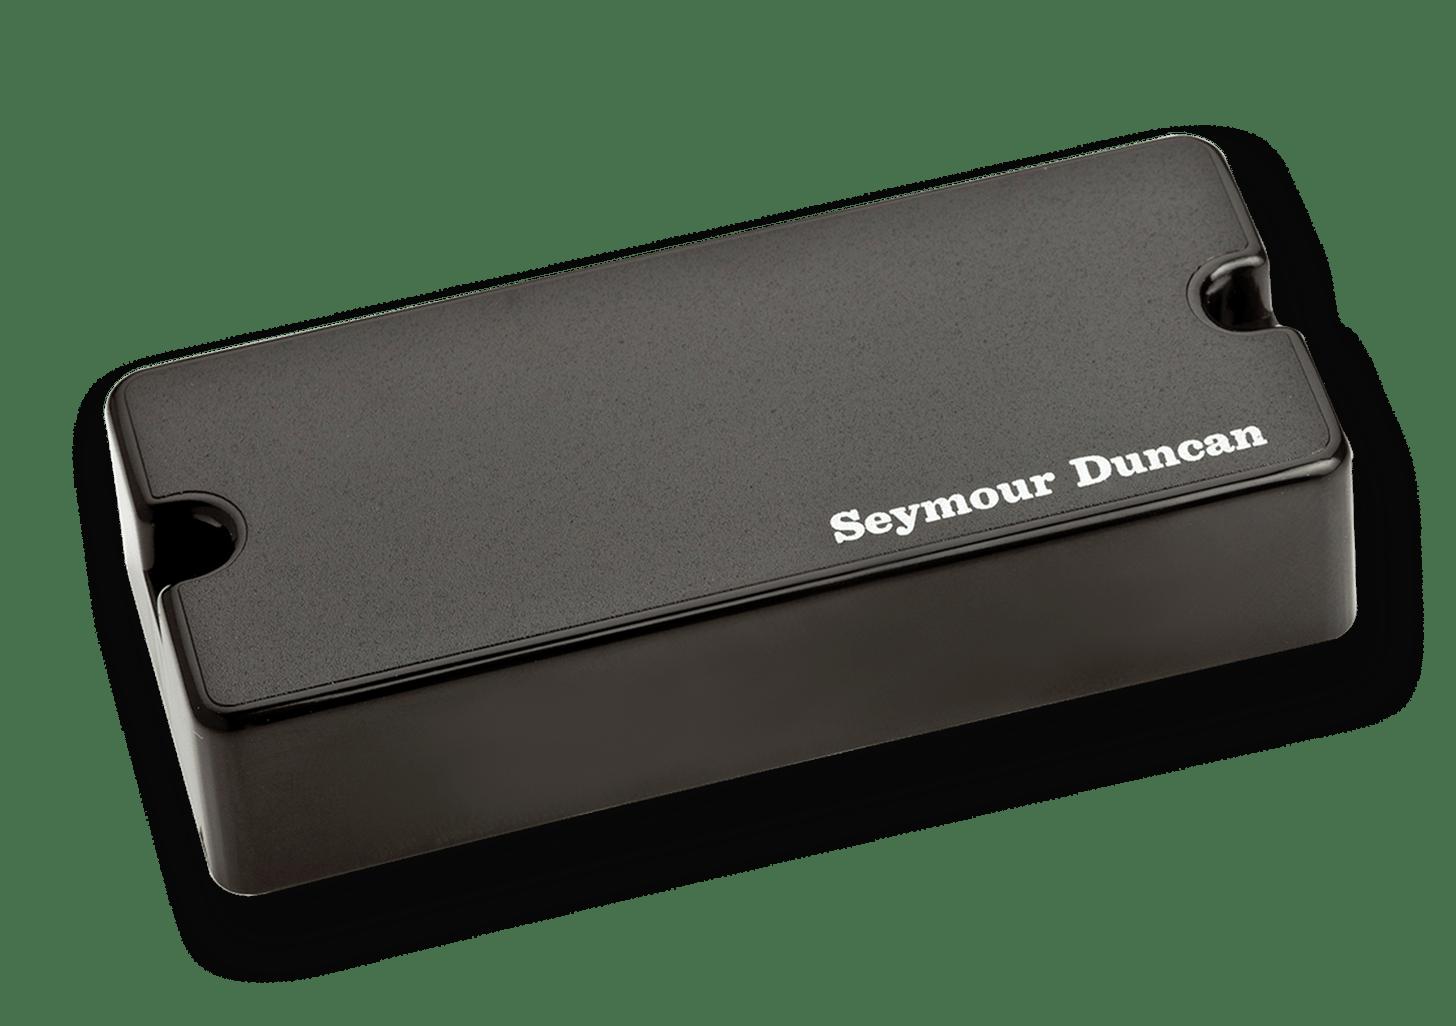 Seymour Duncan Ssb4s Archives